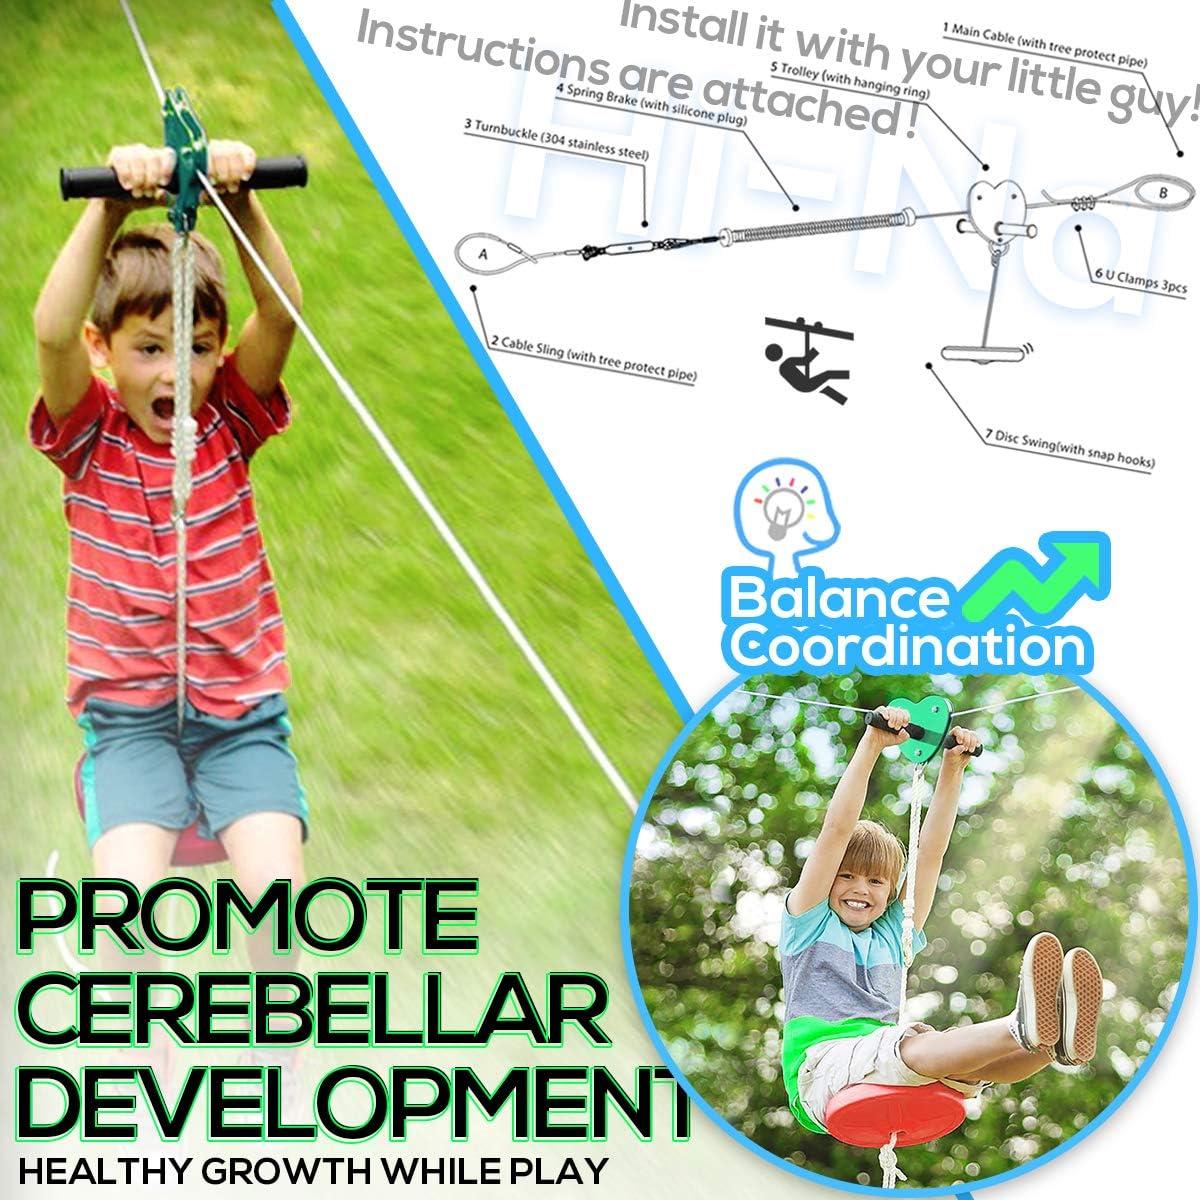 Download Zip Line Kits For Backyard Pics - HomeLooker